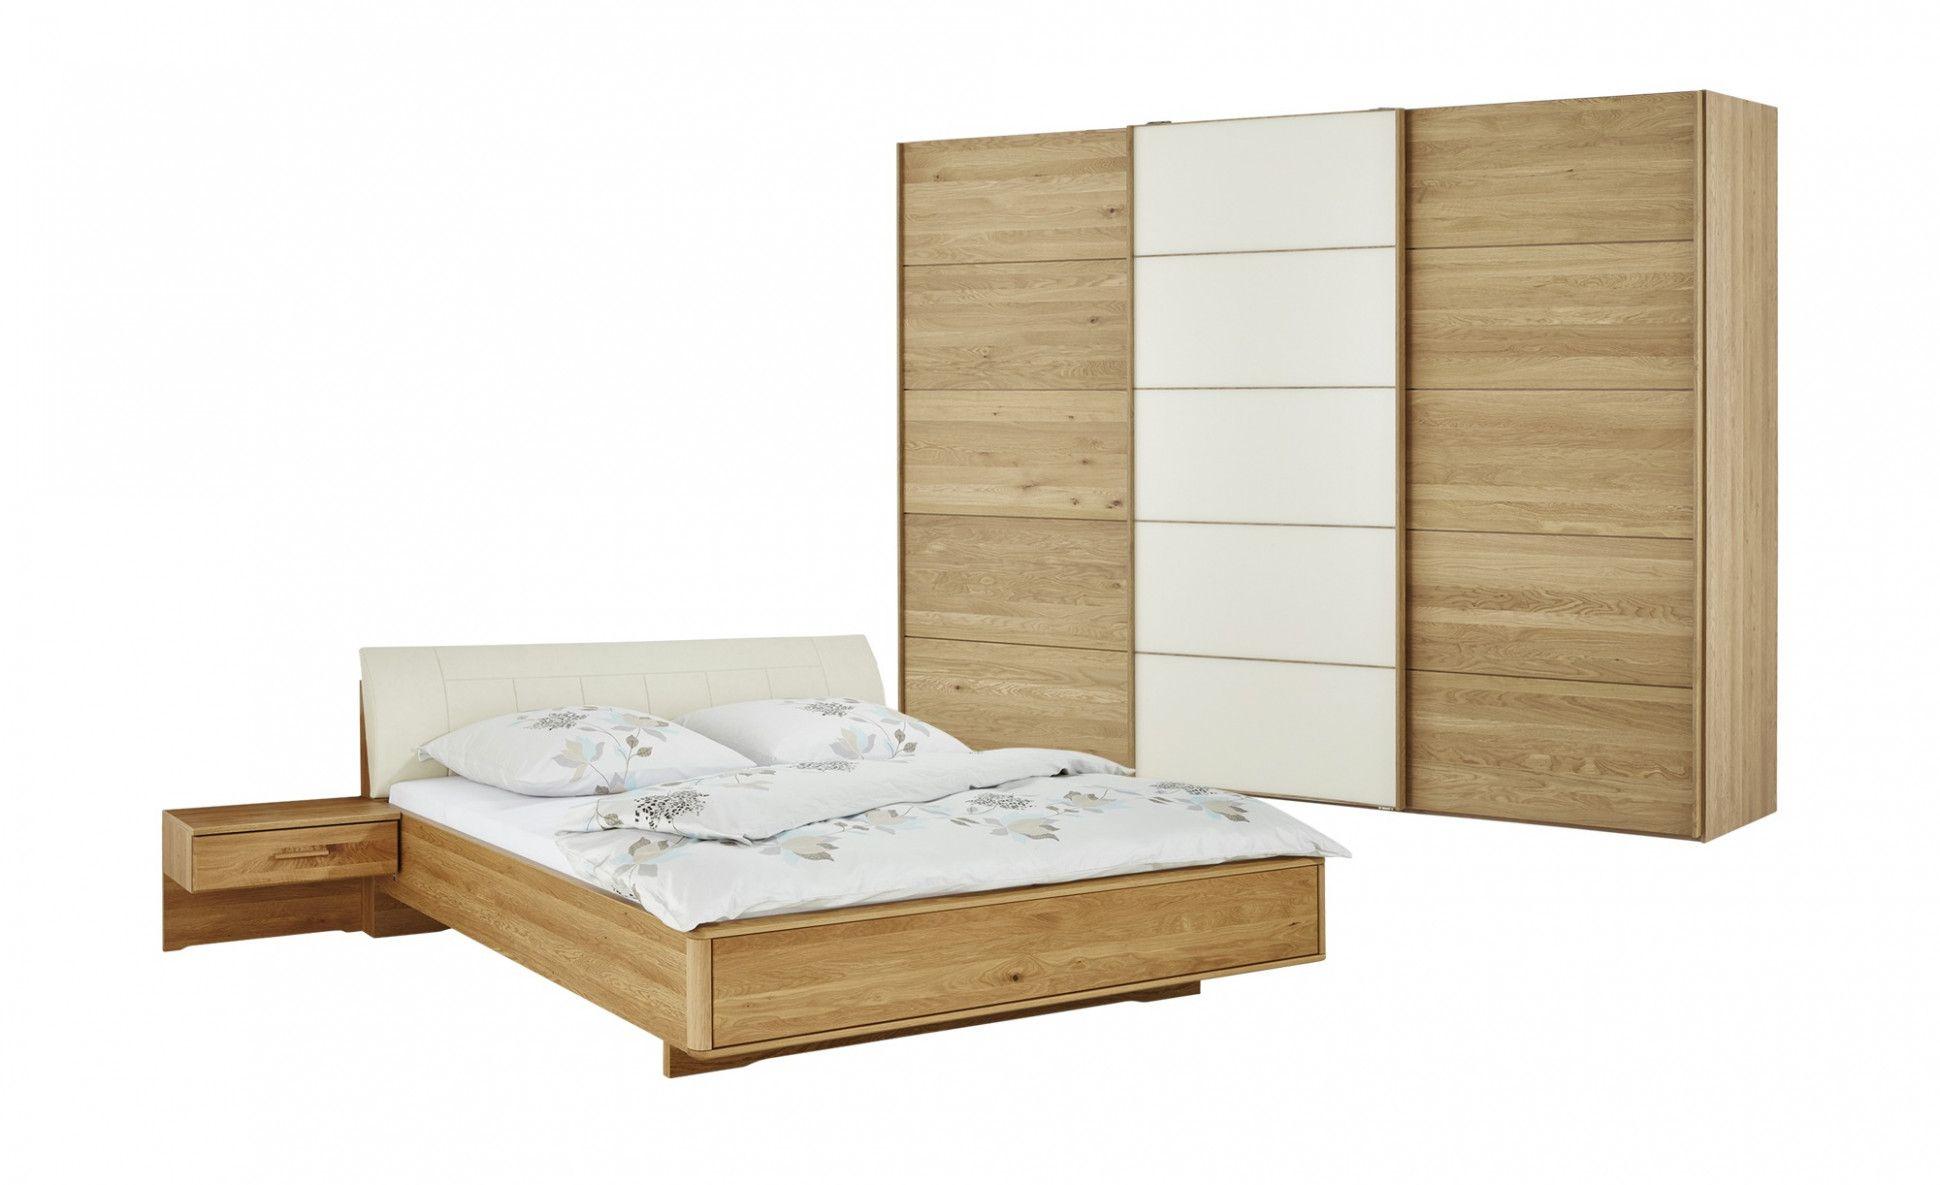 Schlafzimmer Lampe Hoffner